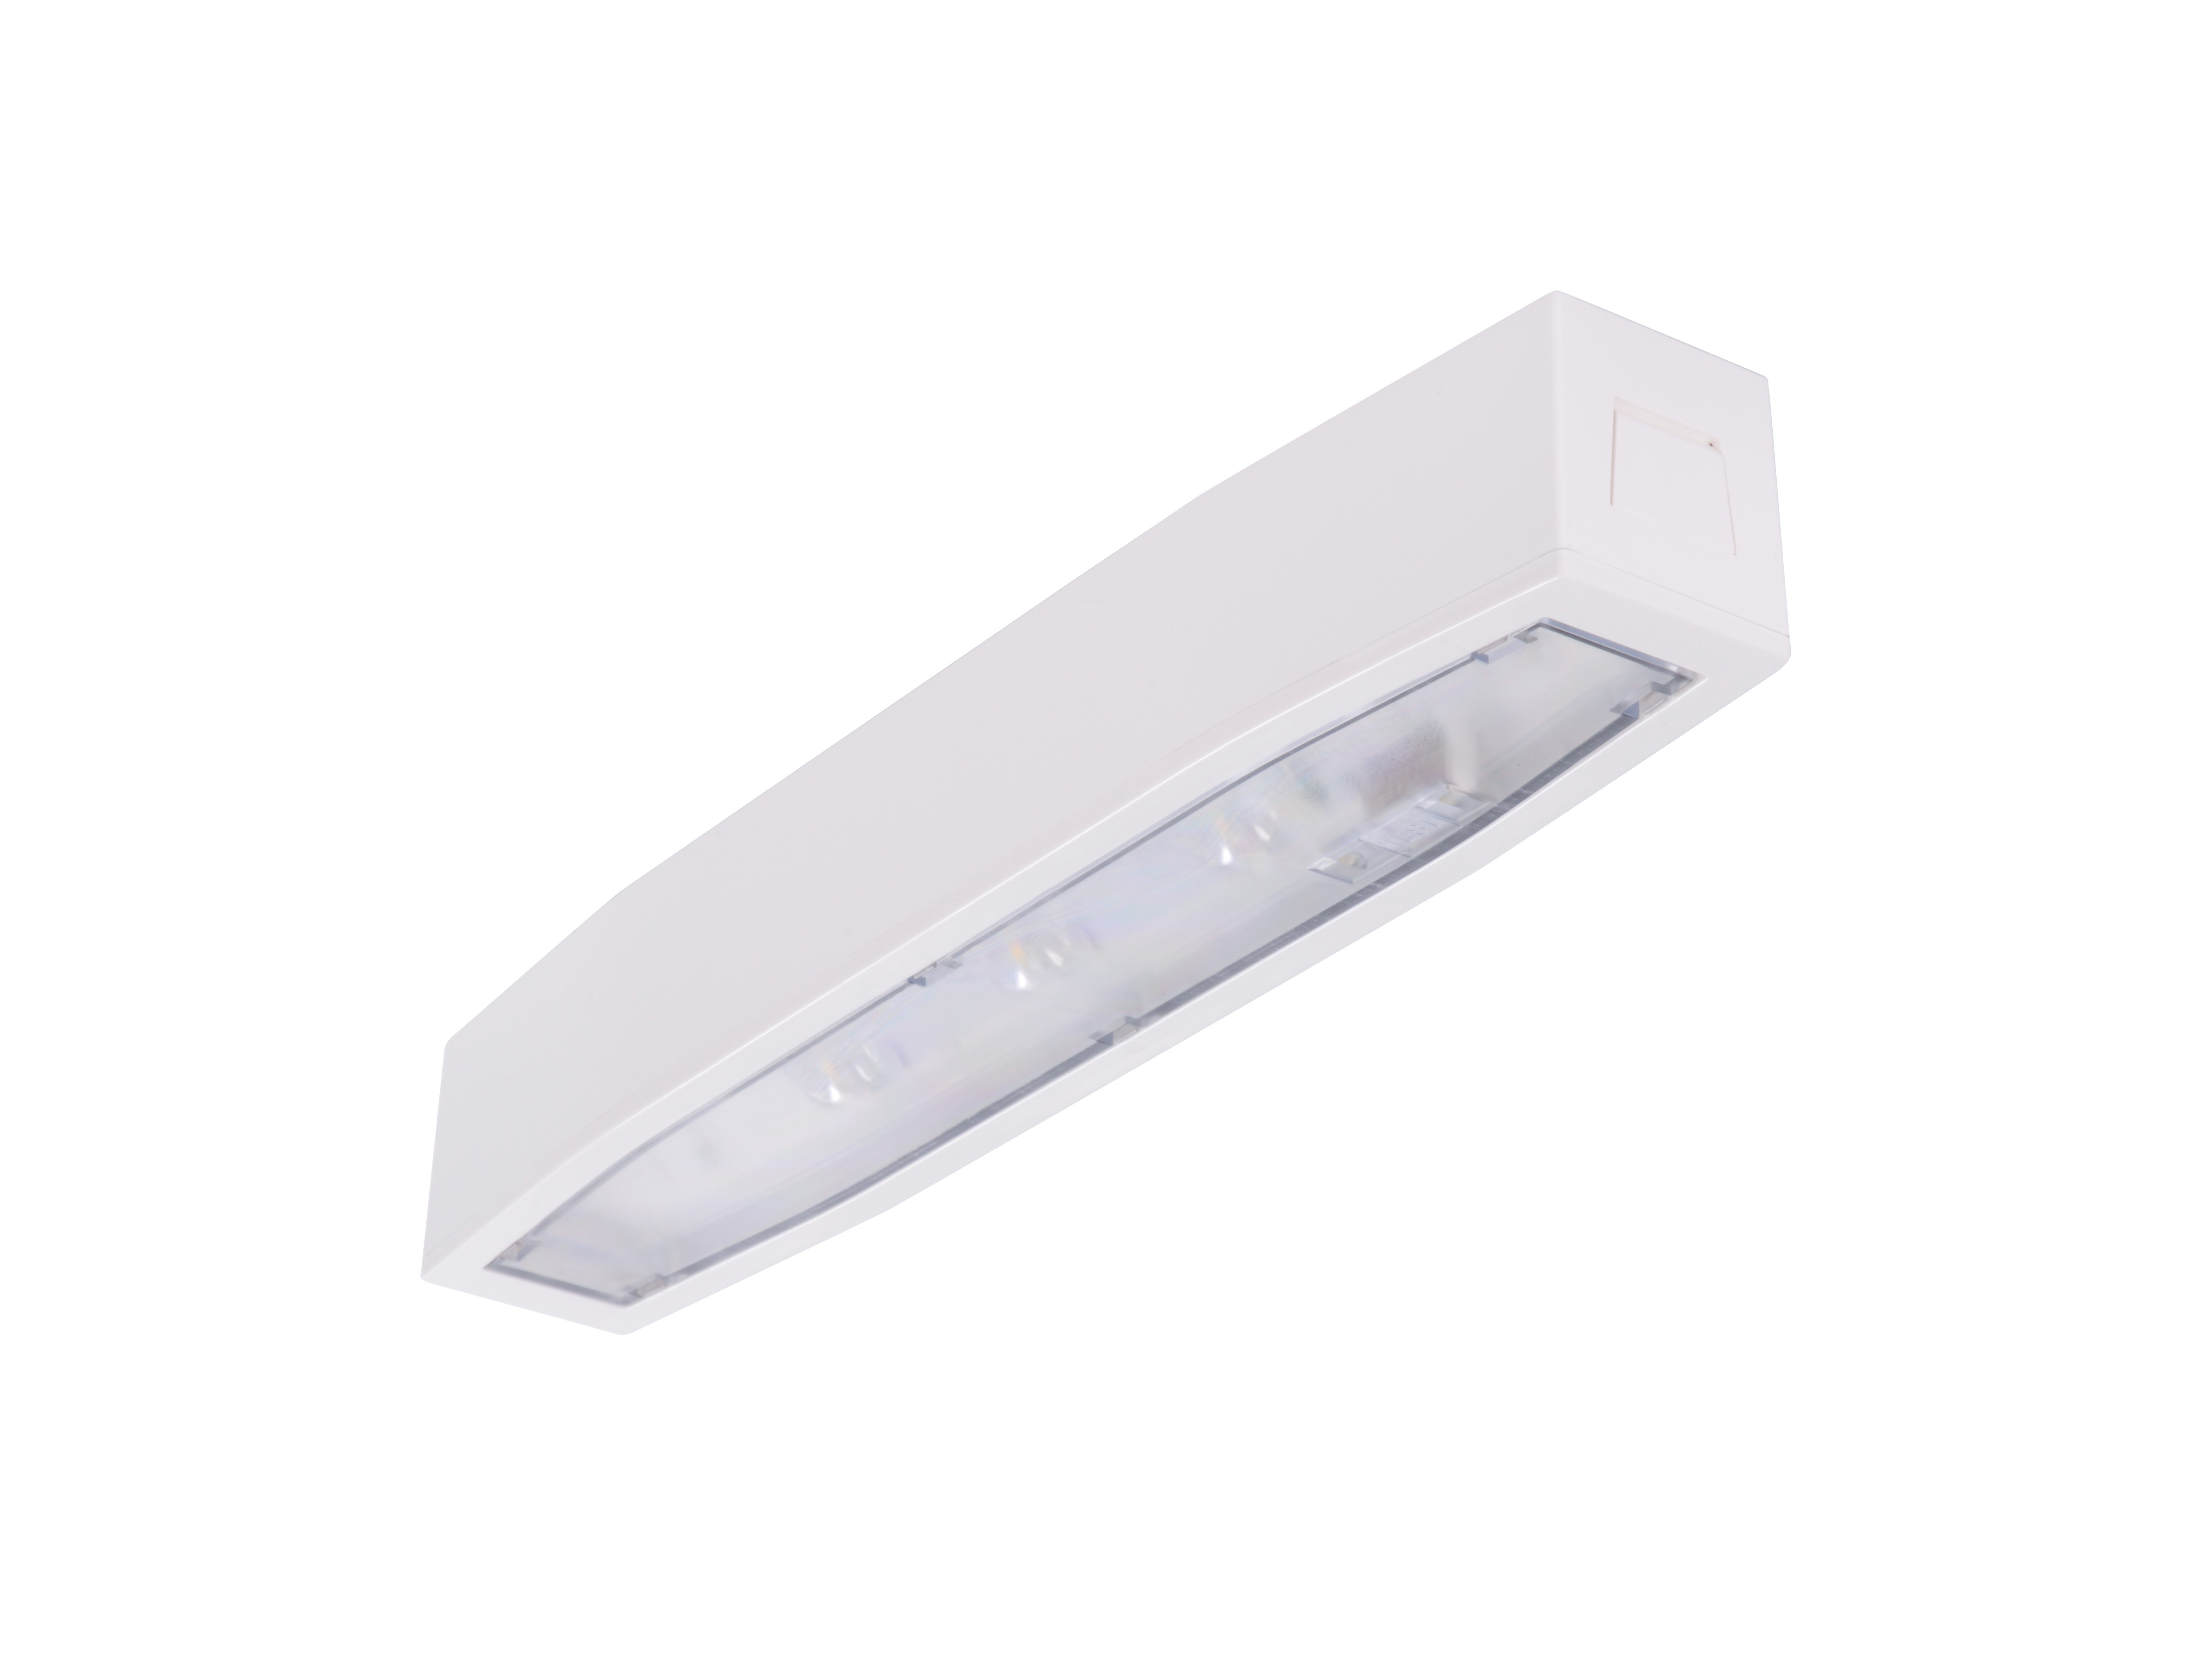 Lampa emergenta led Intelight 94769   3h nementinut test automat 0